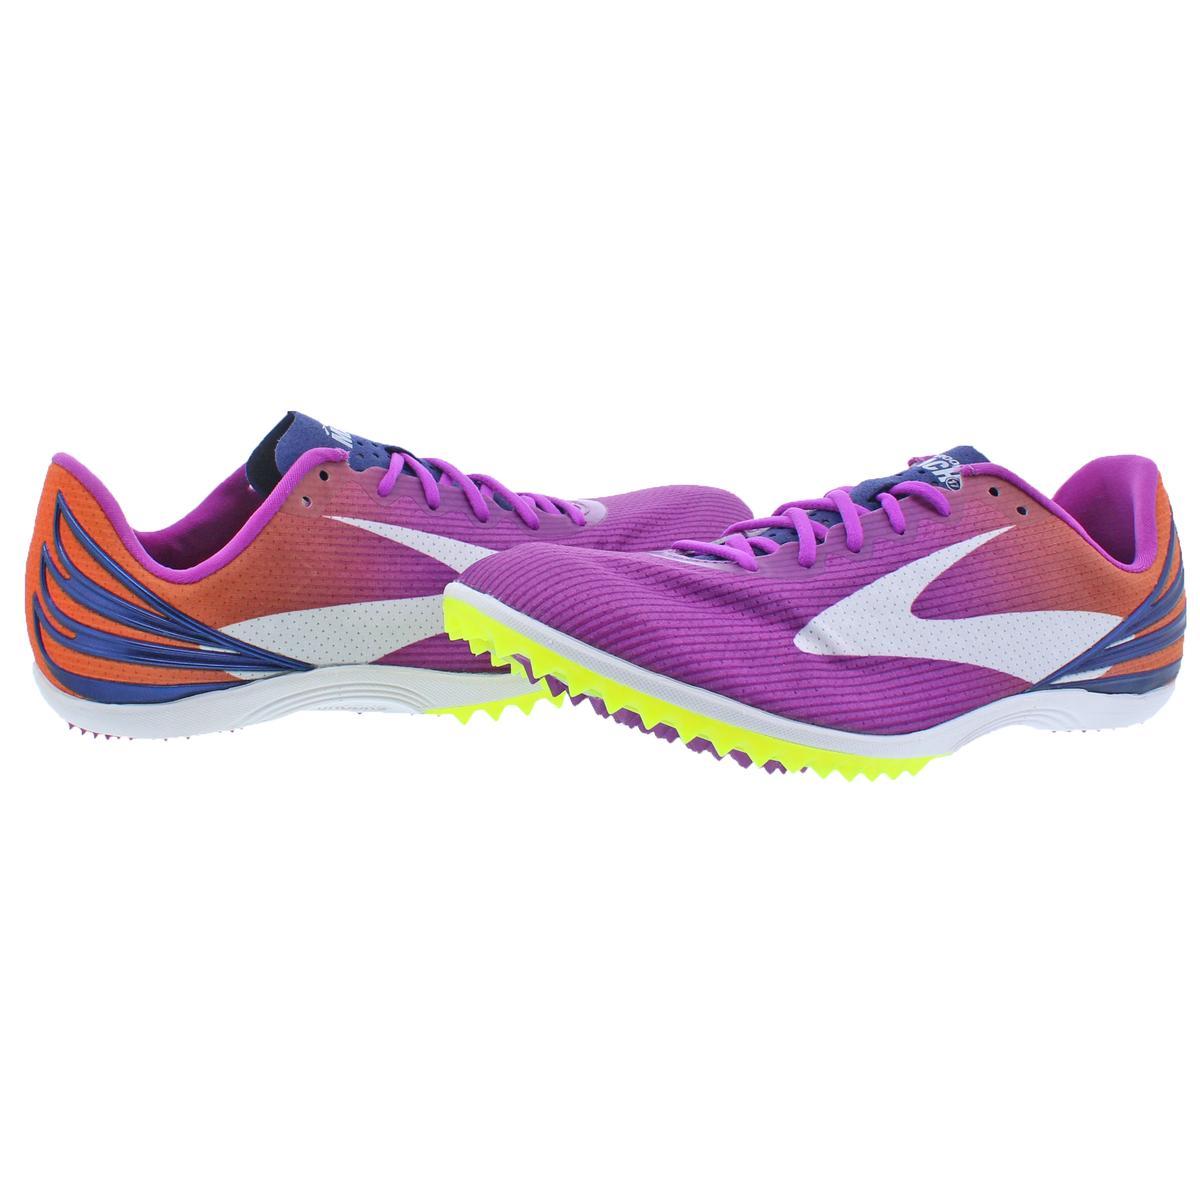 d1b5639f89158 Details about Brooks Womens Mach 17 Spike Purple Track Running Shoes 6  Medium (B